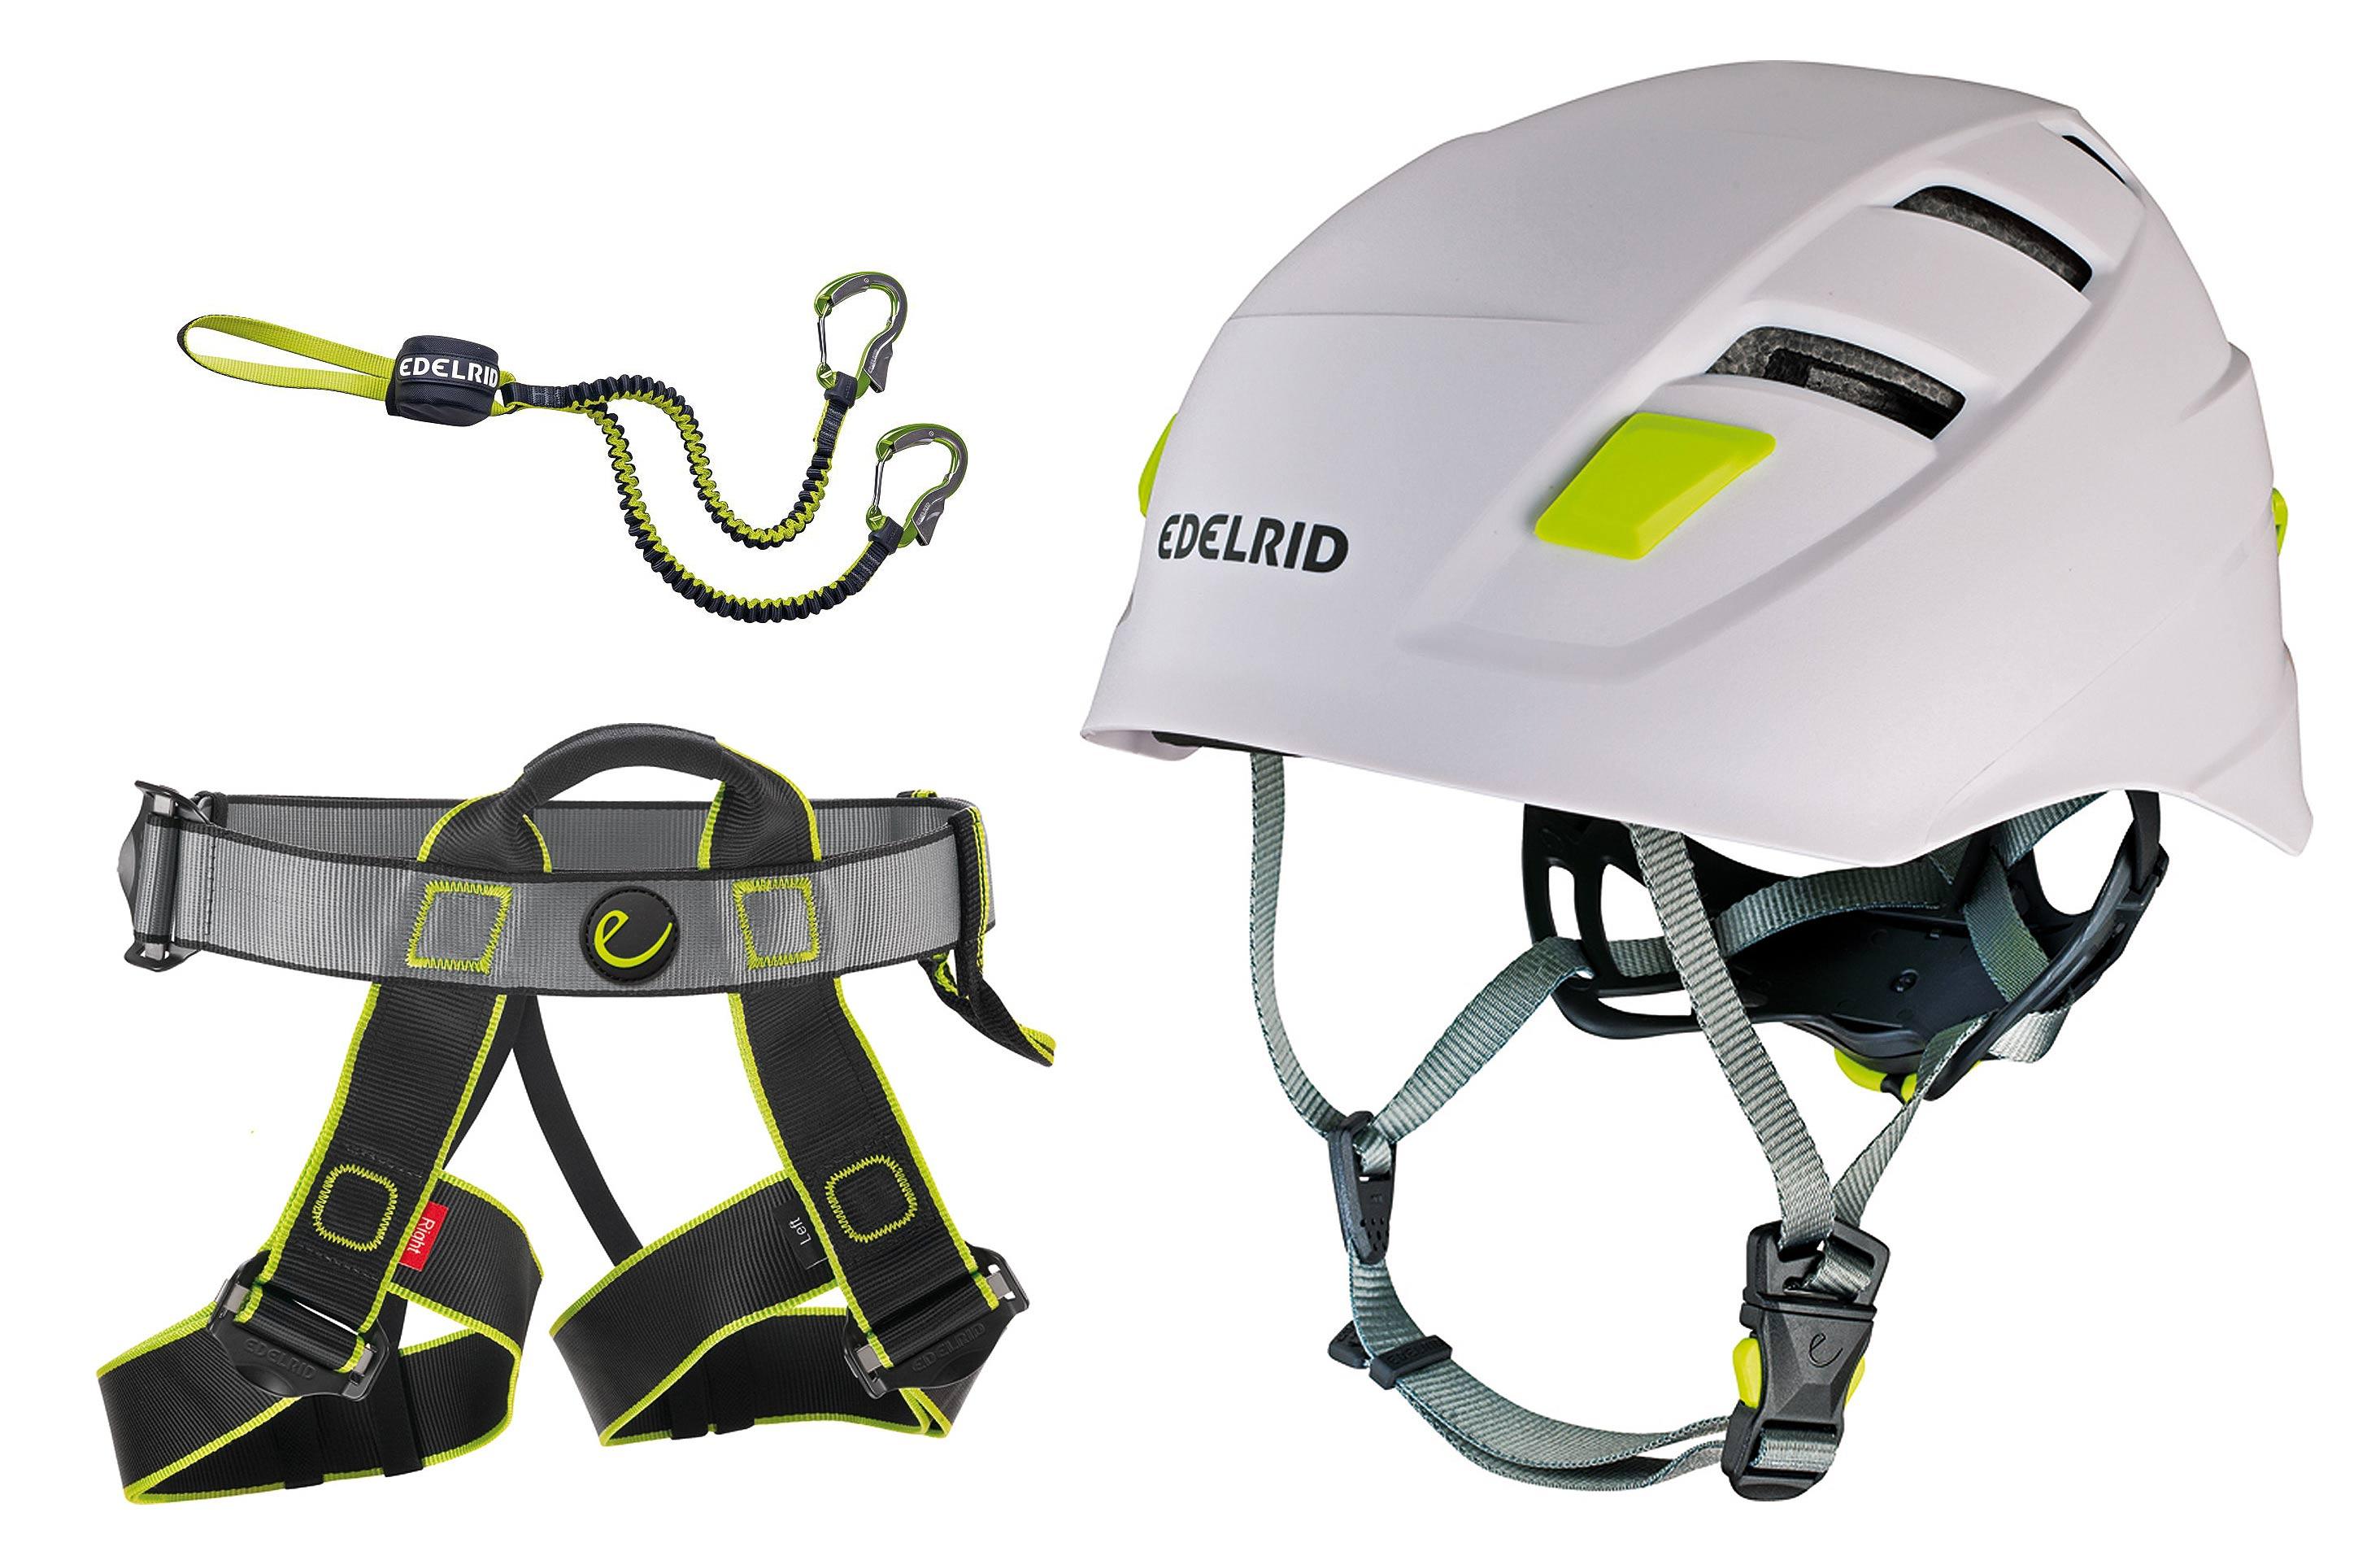 Klettersteigset Welches : Klettersteigset edelrid cable compact gurt joker helm zodiac ebay